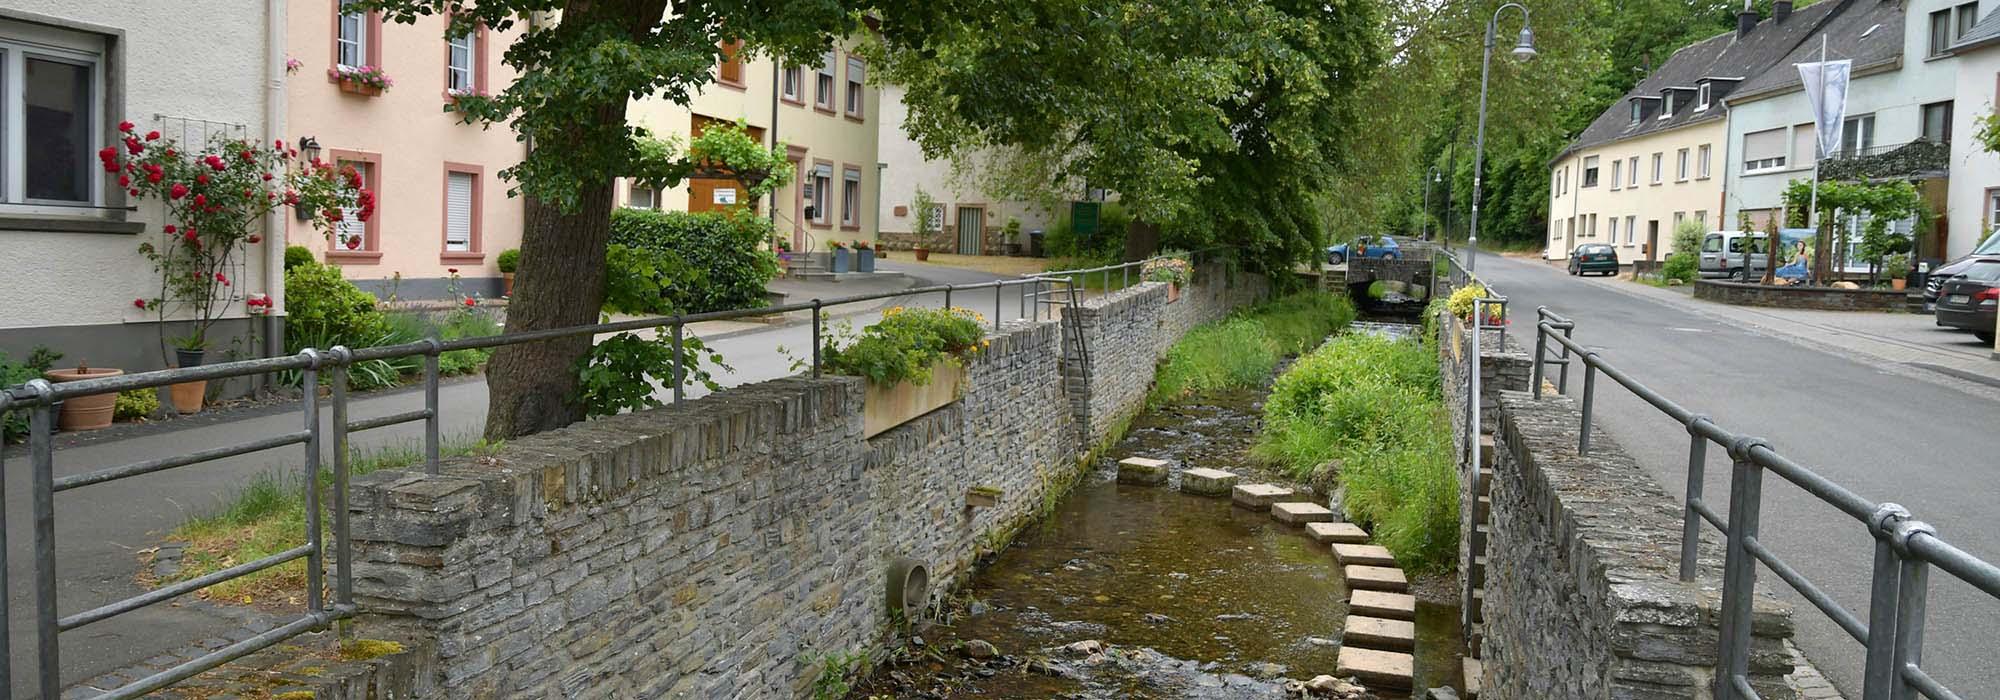 Burgen-Veldenz-ARN_4155